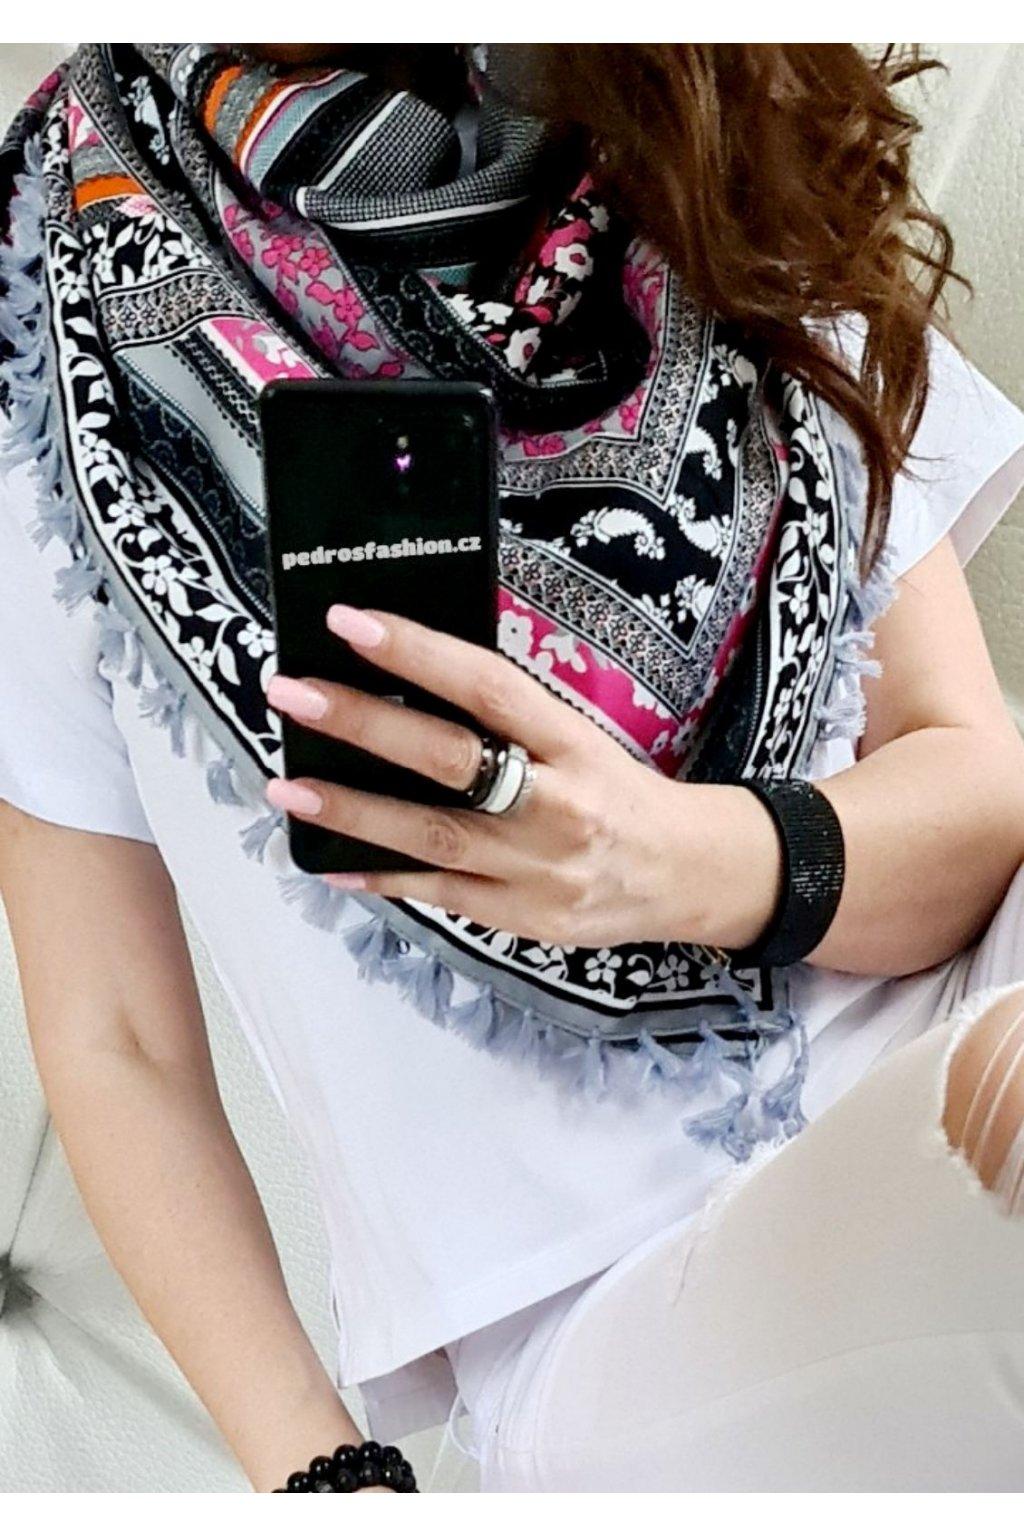 sefaris šátek šedá barva slabší materiál trendy tip na dárek